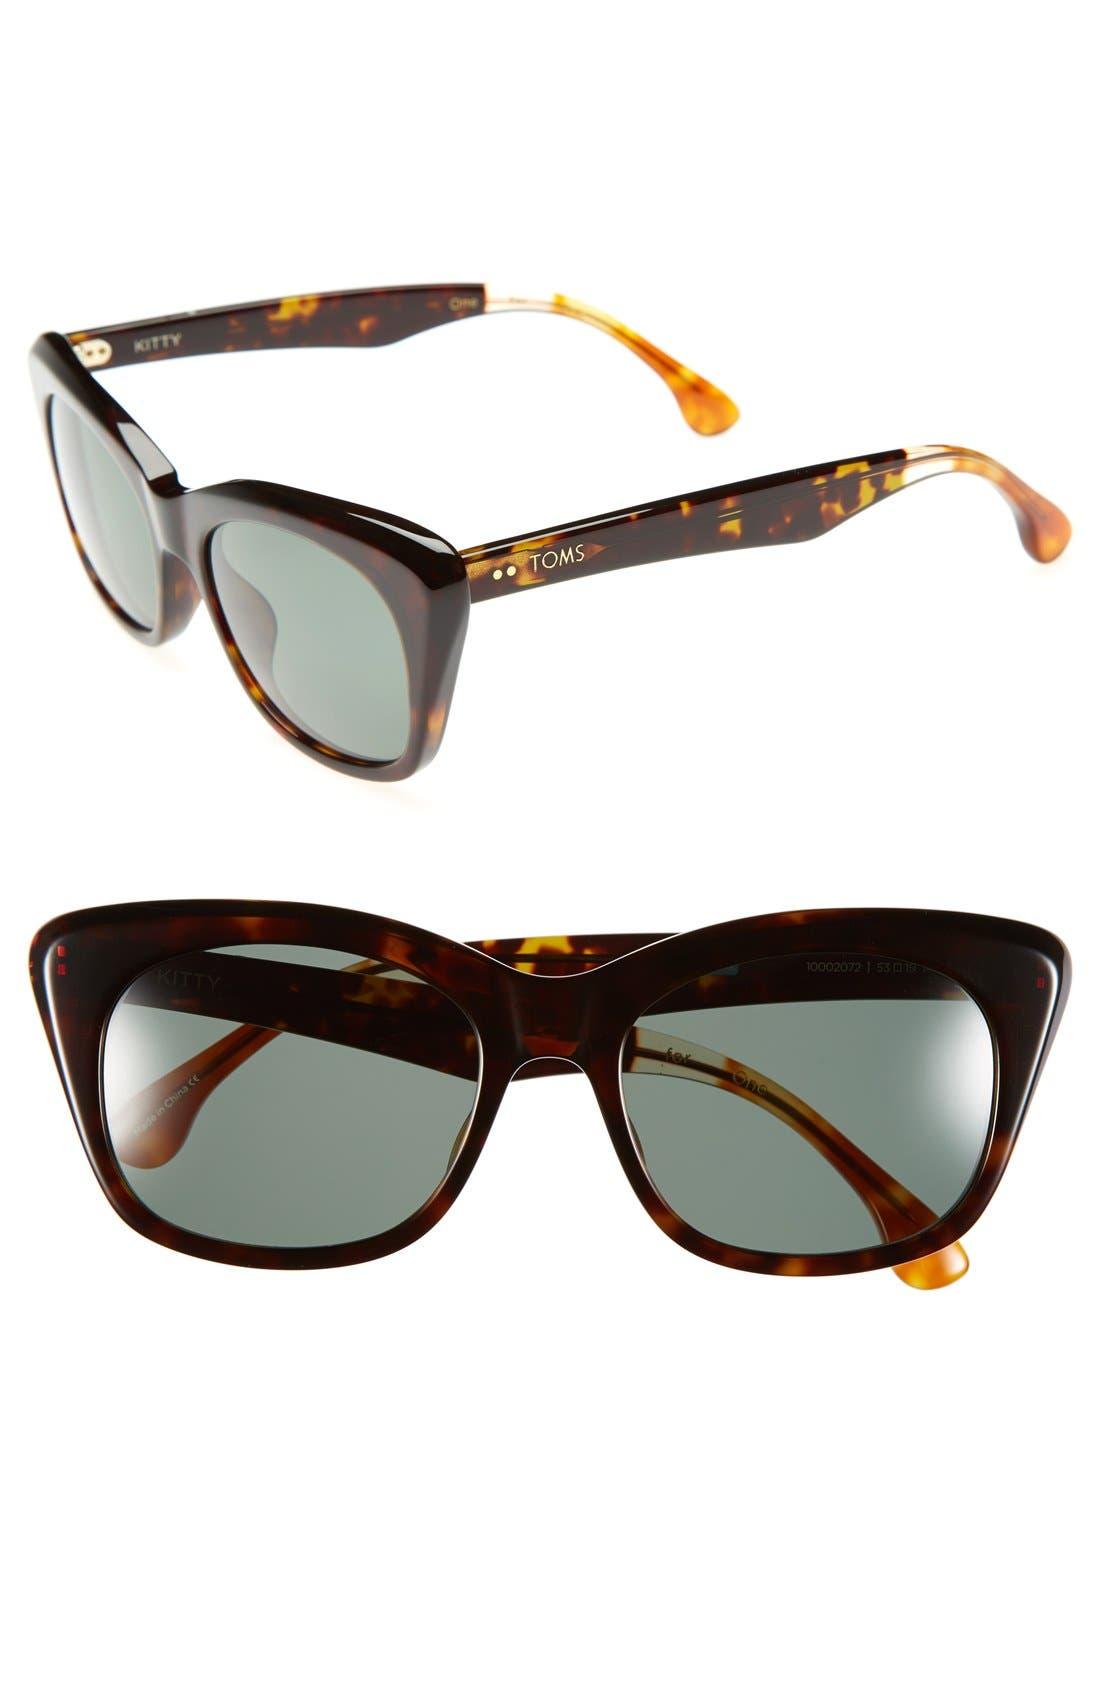 Alternate Image 1 Selected - TOMS 'Kitty' 53mm Polarized Cat Eye Sunglasses